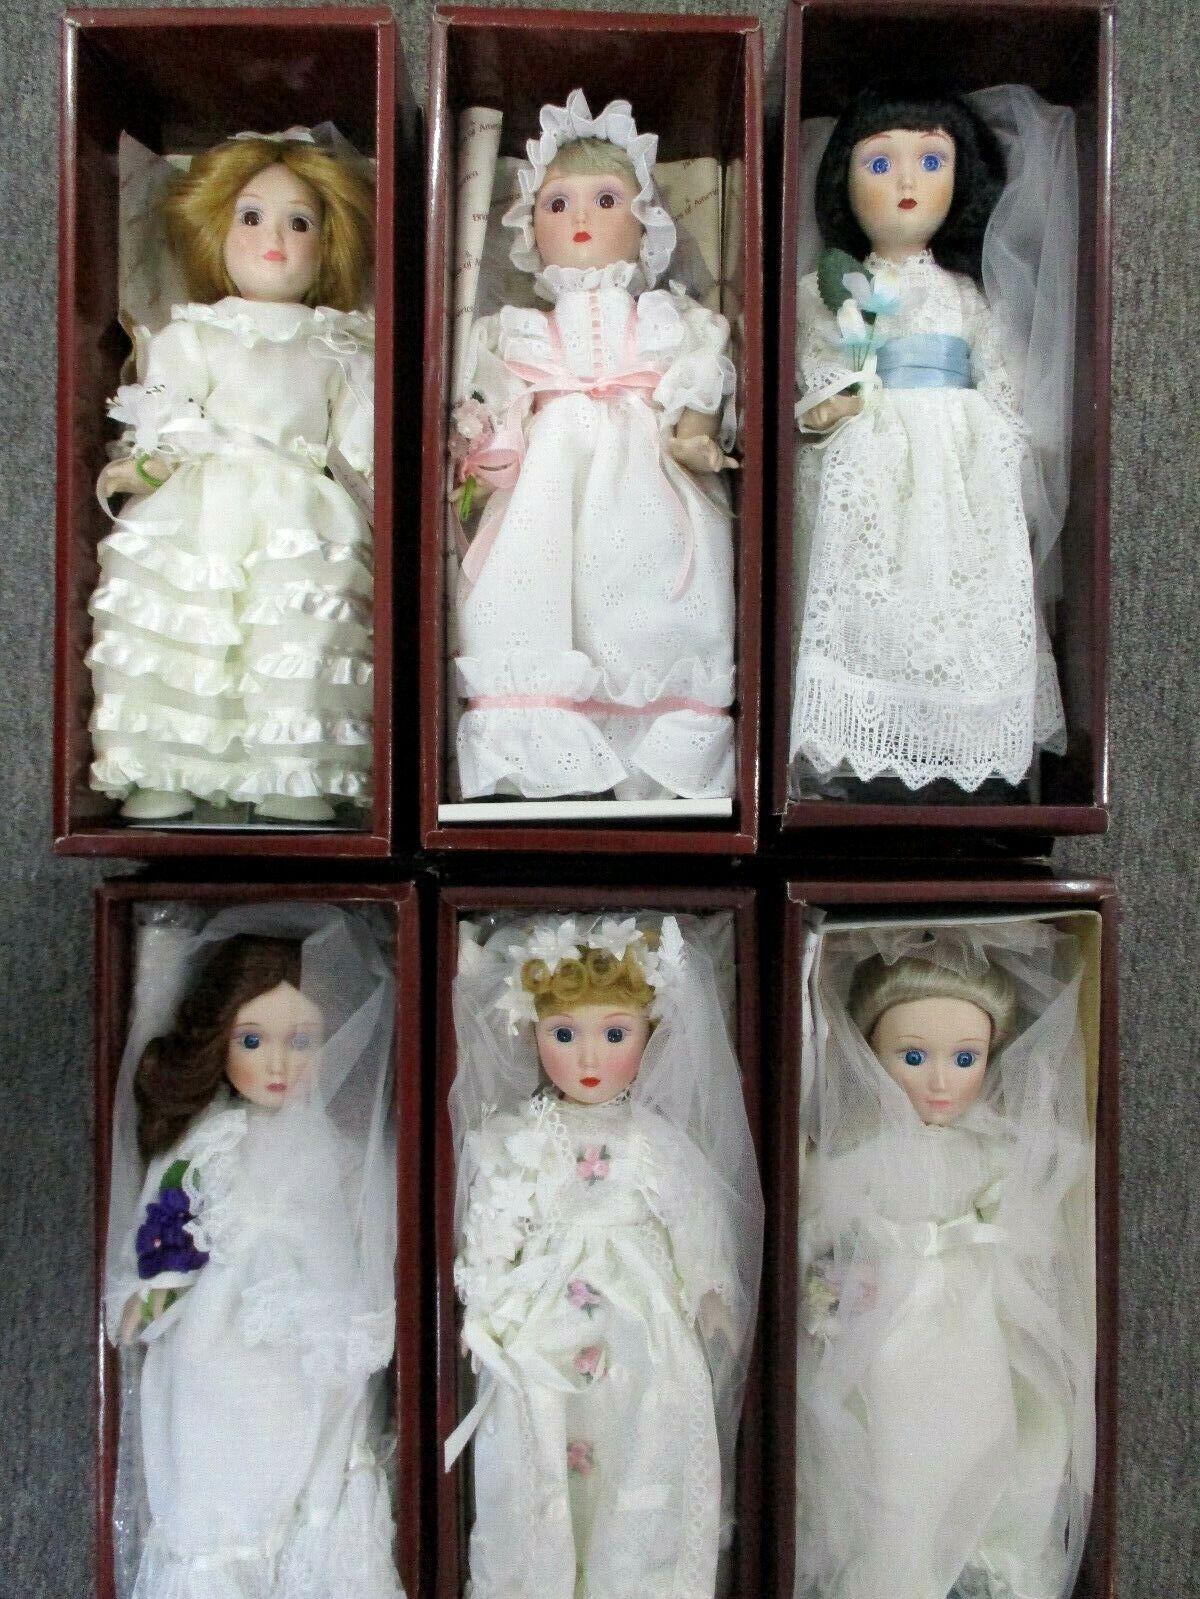 Danbury Mint Brides Of America Porcelain Dolls Lot of 6 In Original Boxes Lot-B